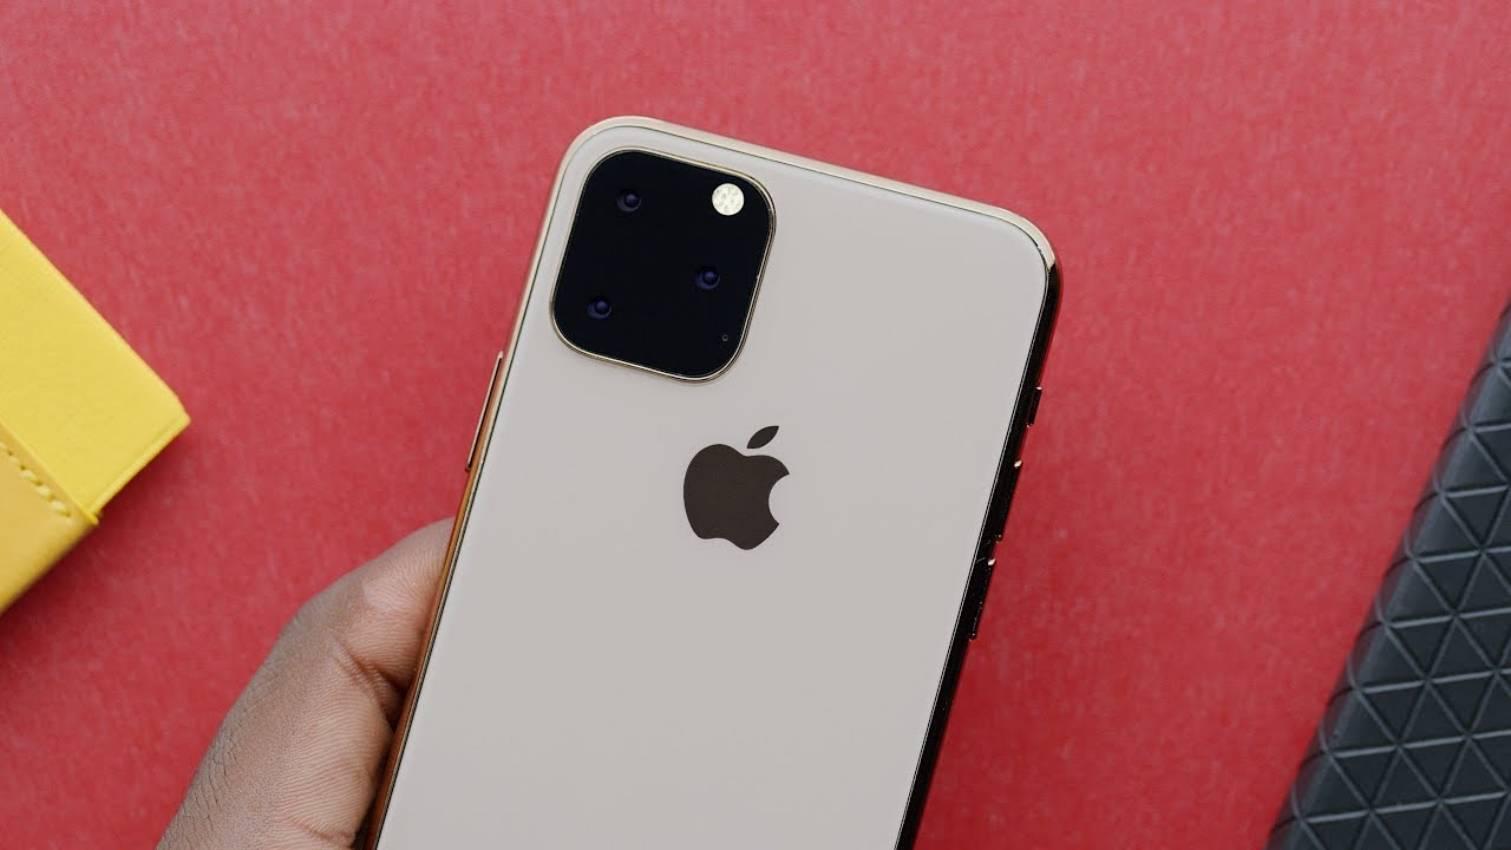 Productia iPhone 11 Incepe cu o Runda MASIVA de Angajari